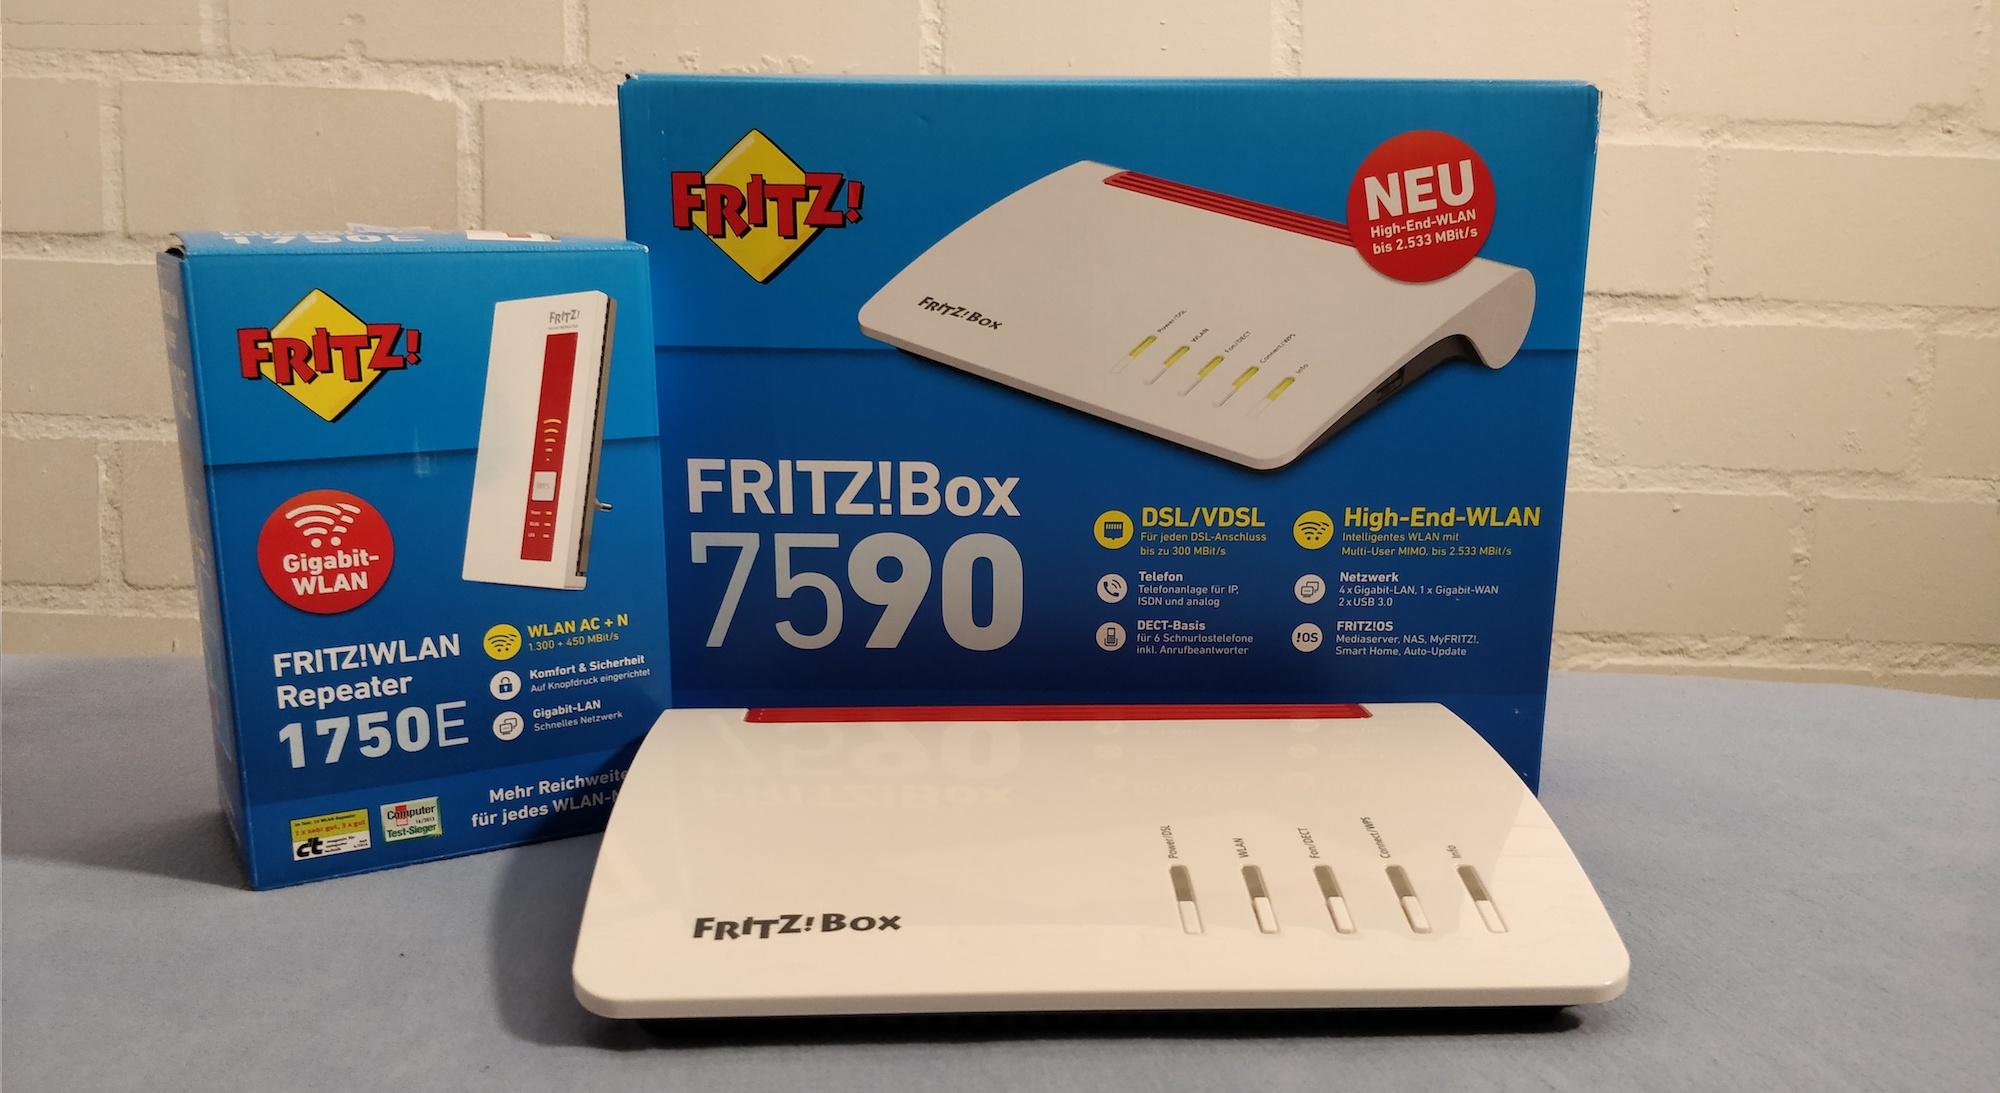 FRITZ!Box 7590 und FRITZ!Repeater 1750E im Langzeittest